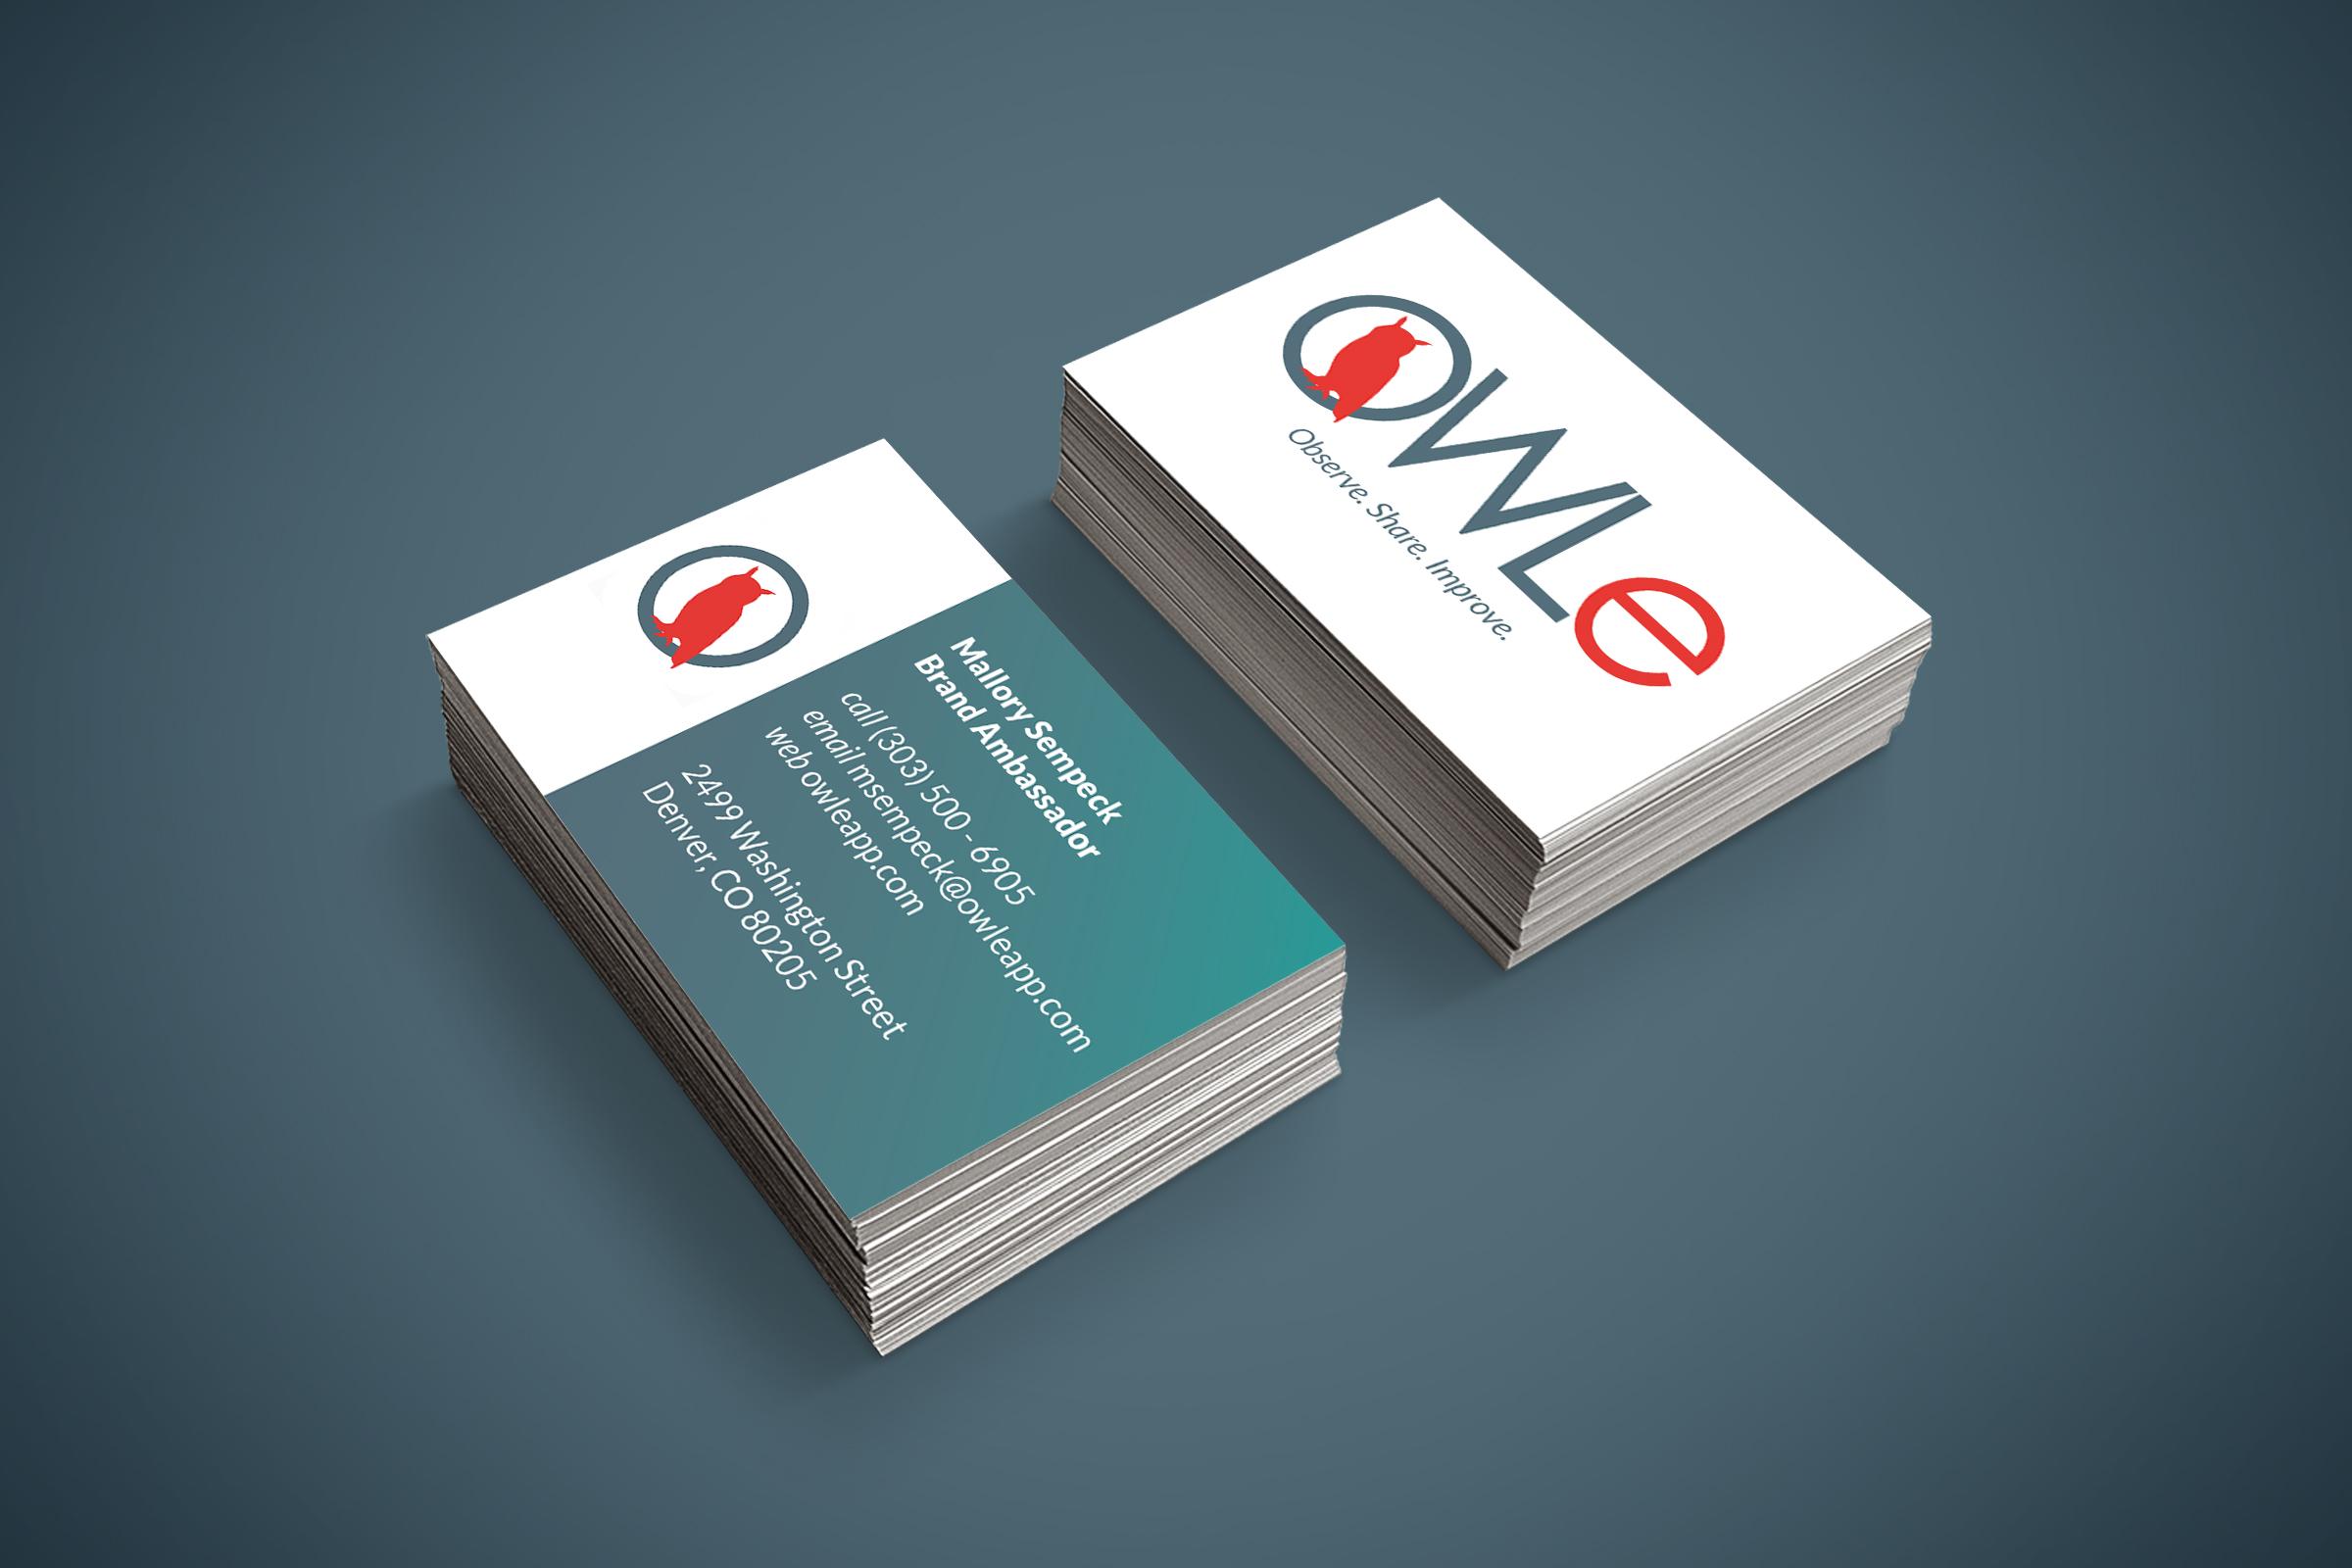 hearthfire-creative-marketing-collateral-brand-identity-designer-denver-colorado-owle-1.jpg